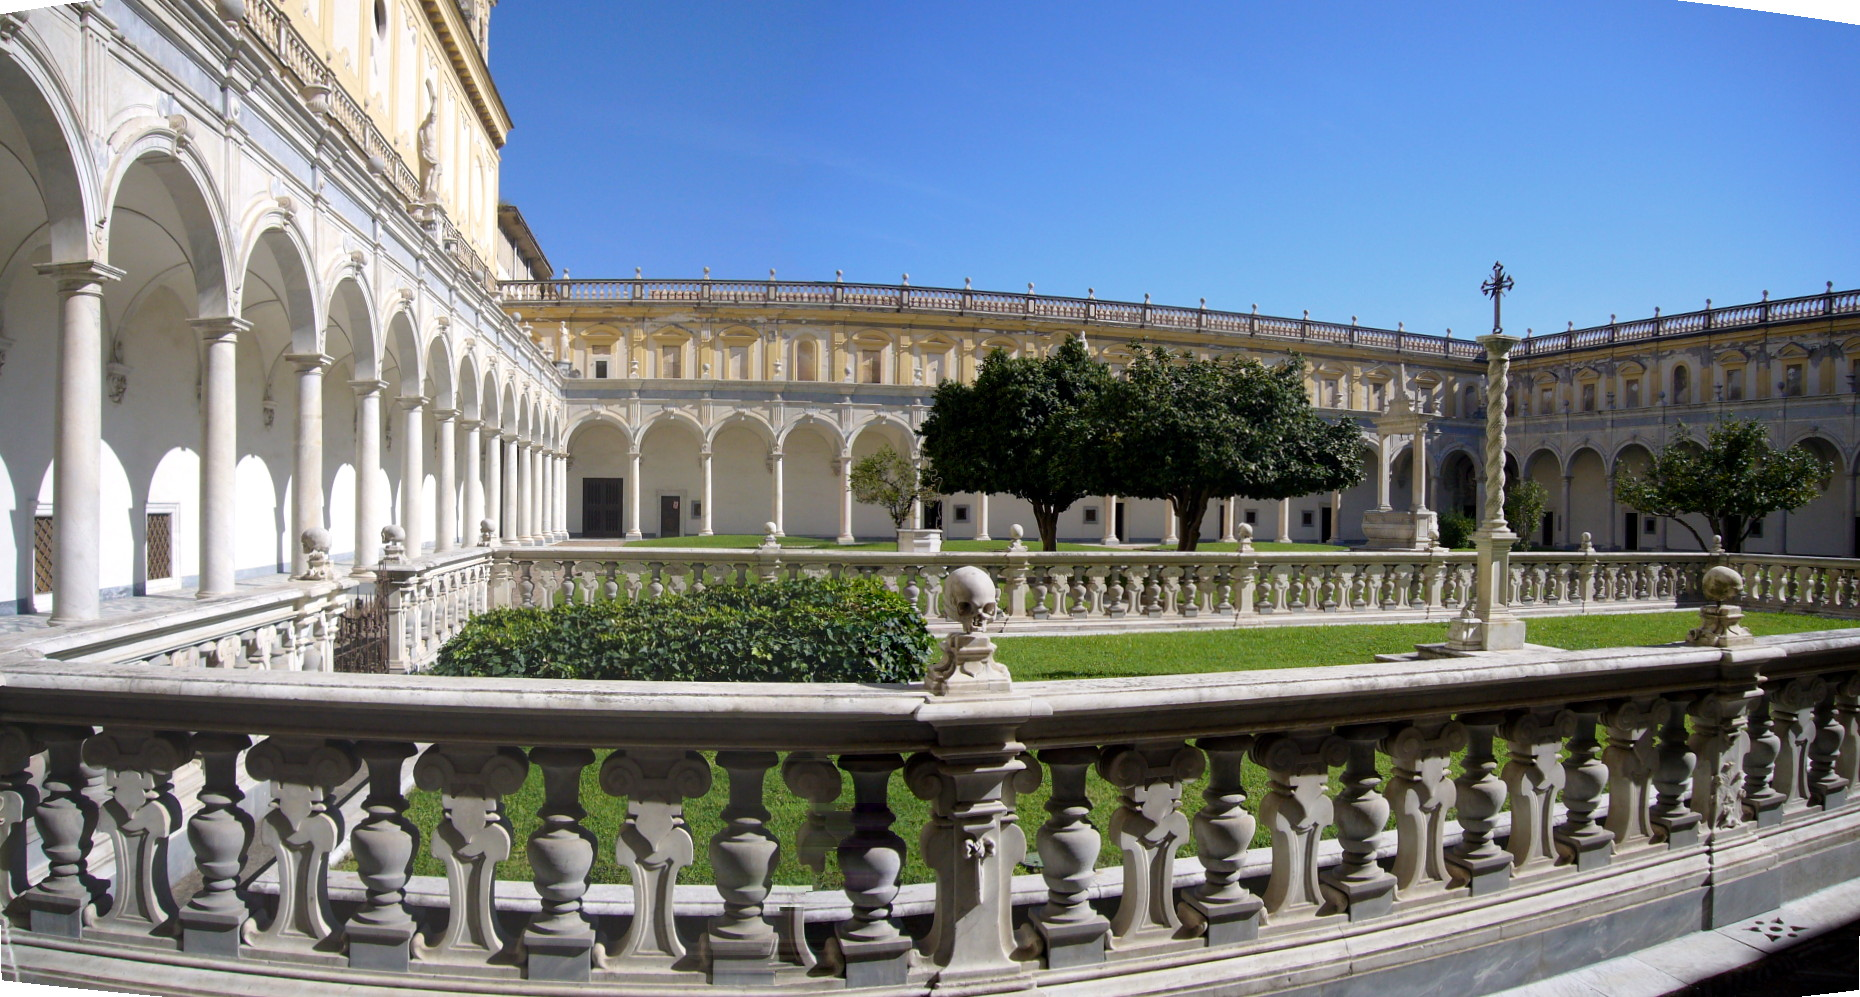 The courtyard of the Certosa di San Martino, Naples